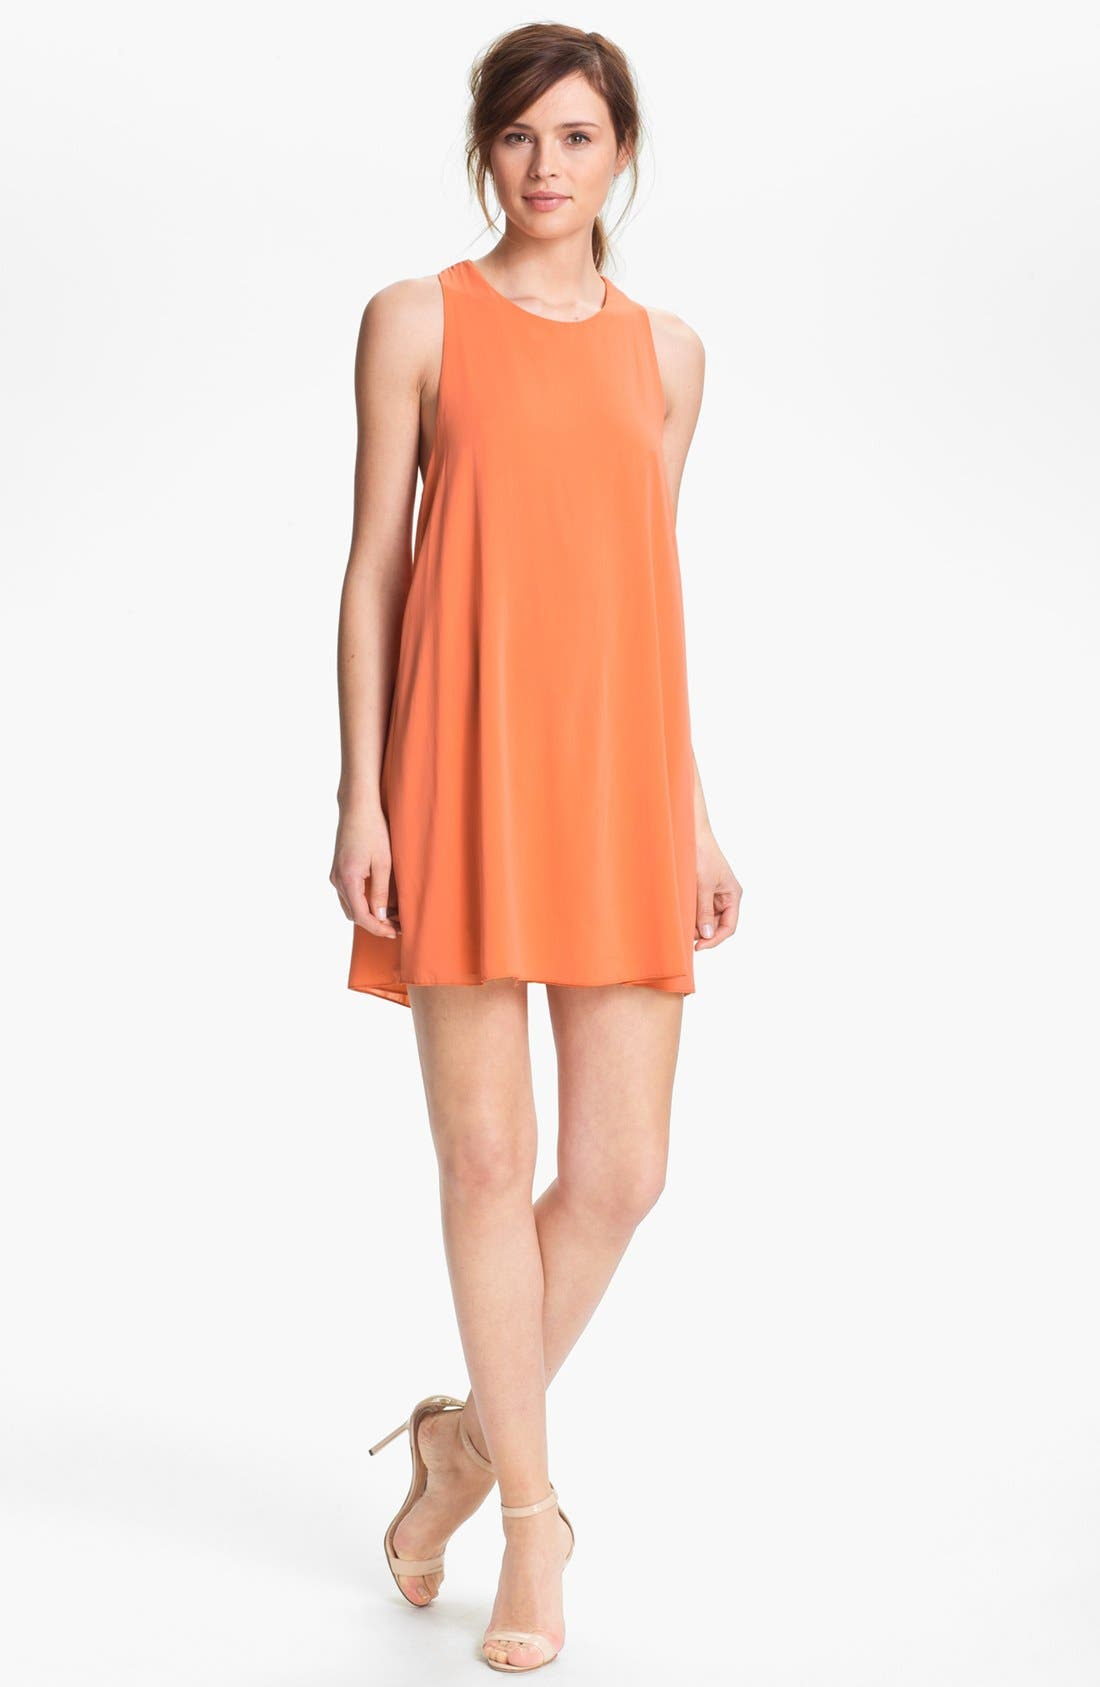 Alternate Image 1 Selected - Alice + Olivia 'Marion' Twist Back Tunic Dress